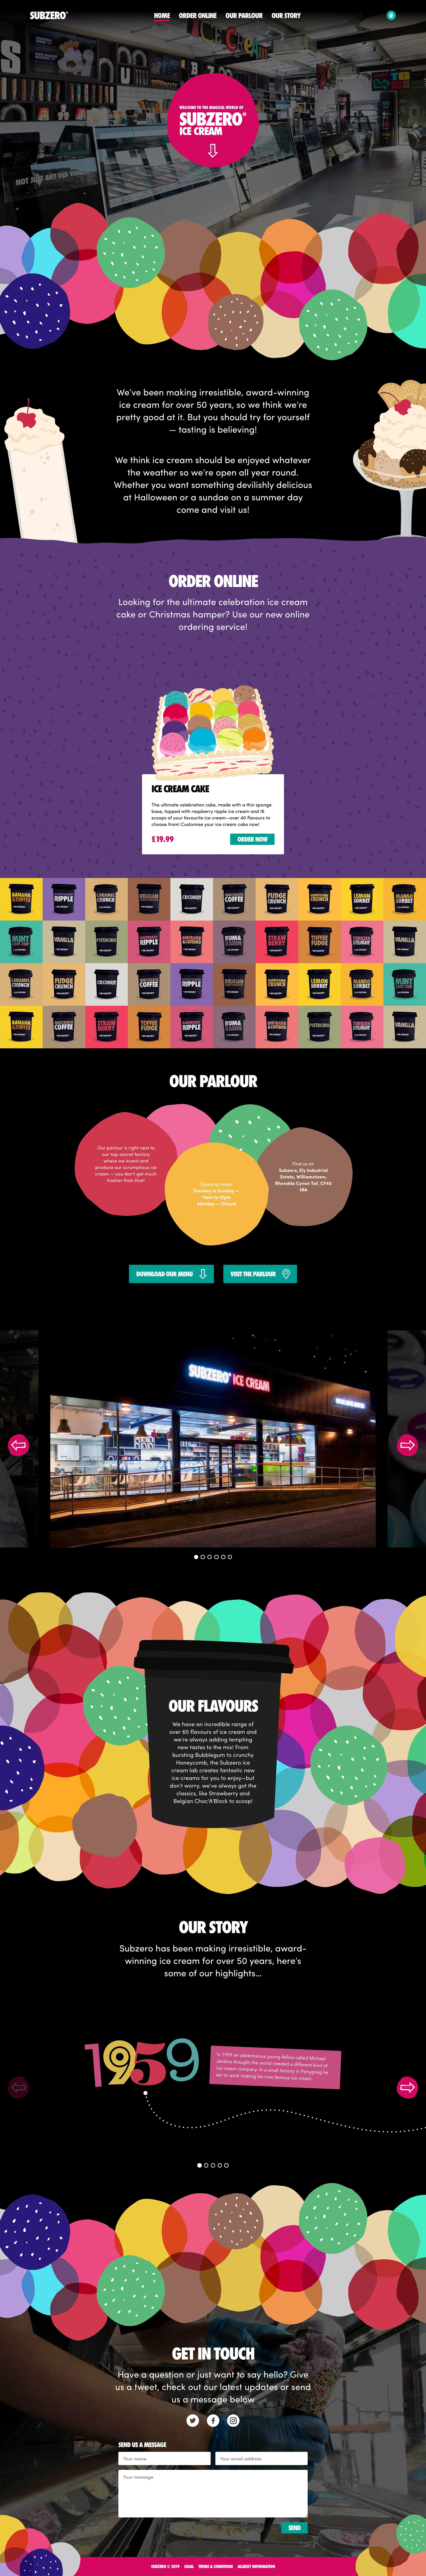 Subzero Ice Cream Website Screenshot